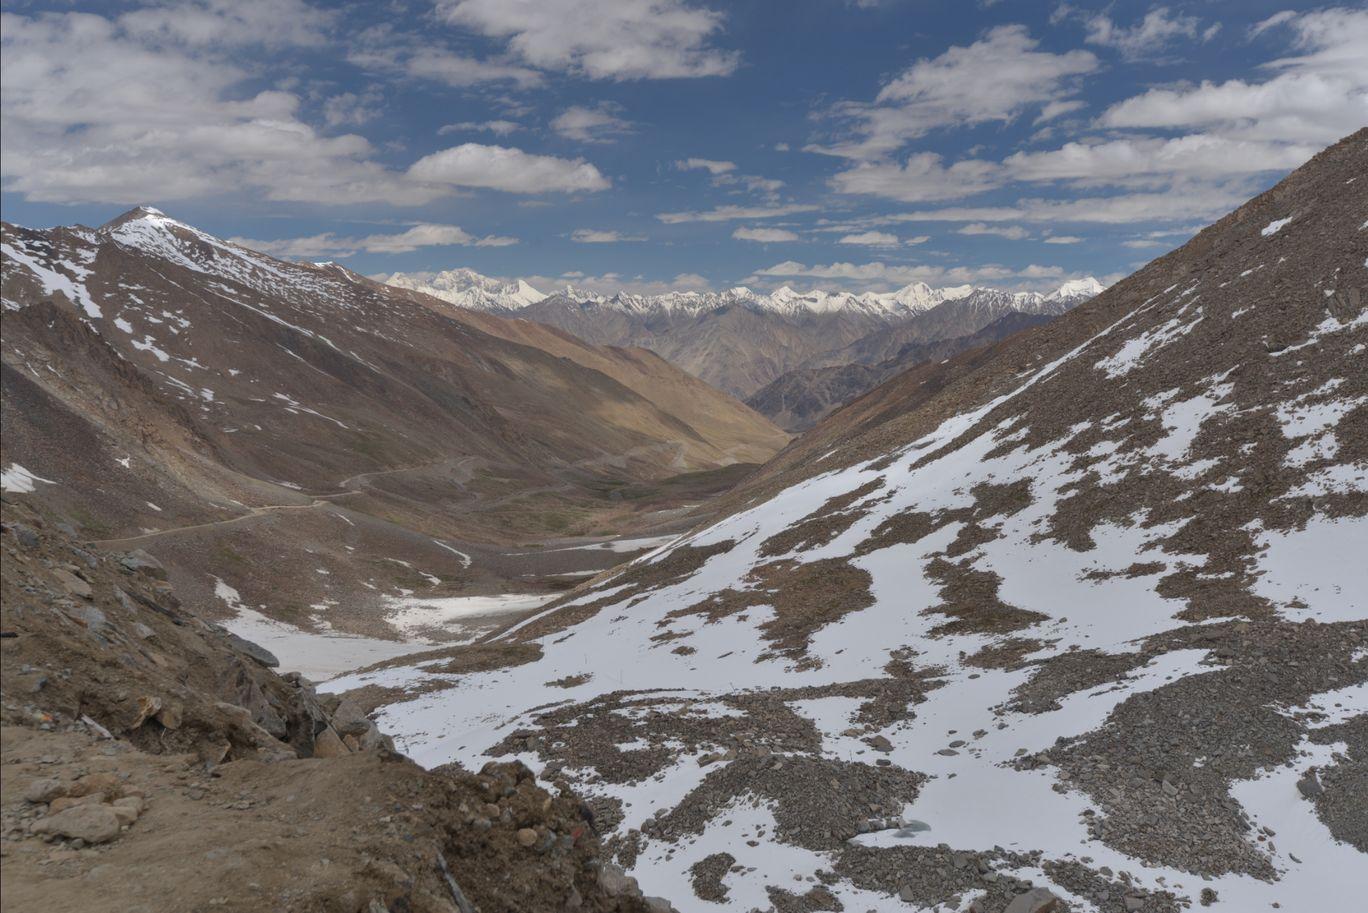 Photo of Nubra Valley By Aditi Shinde